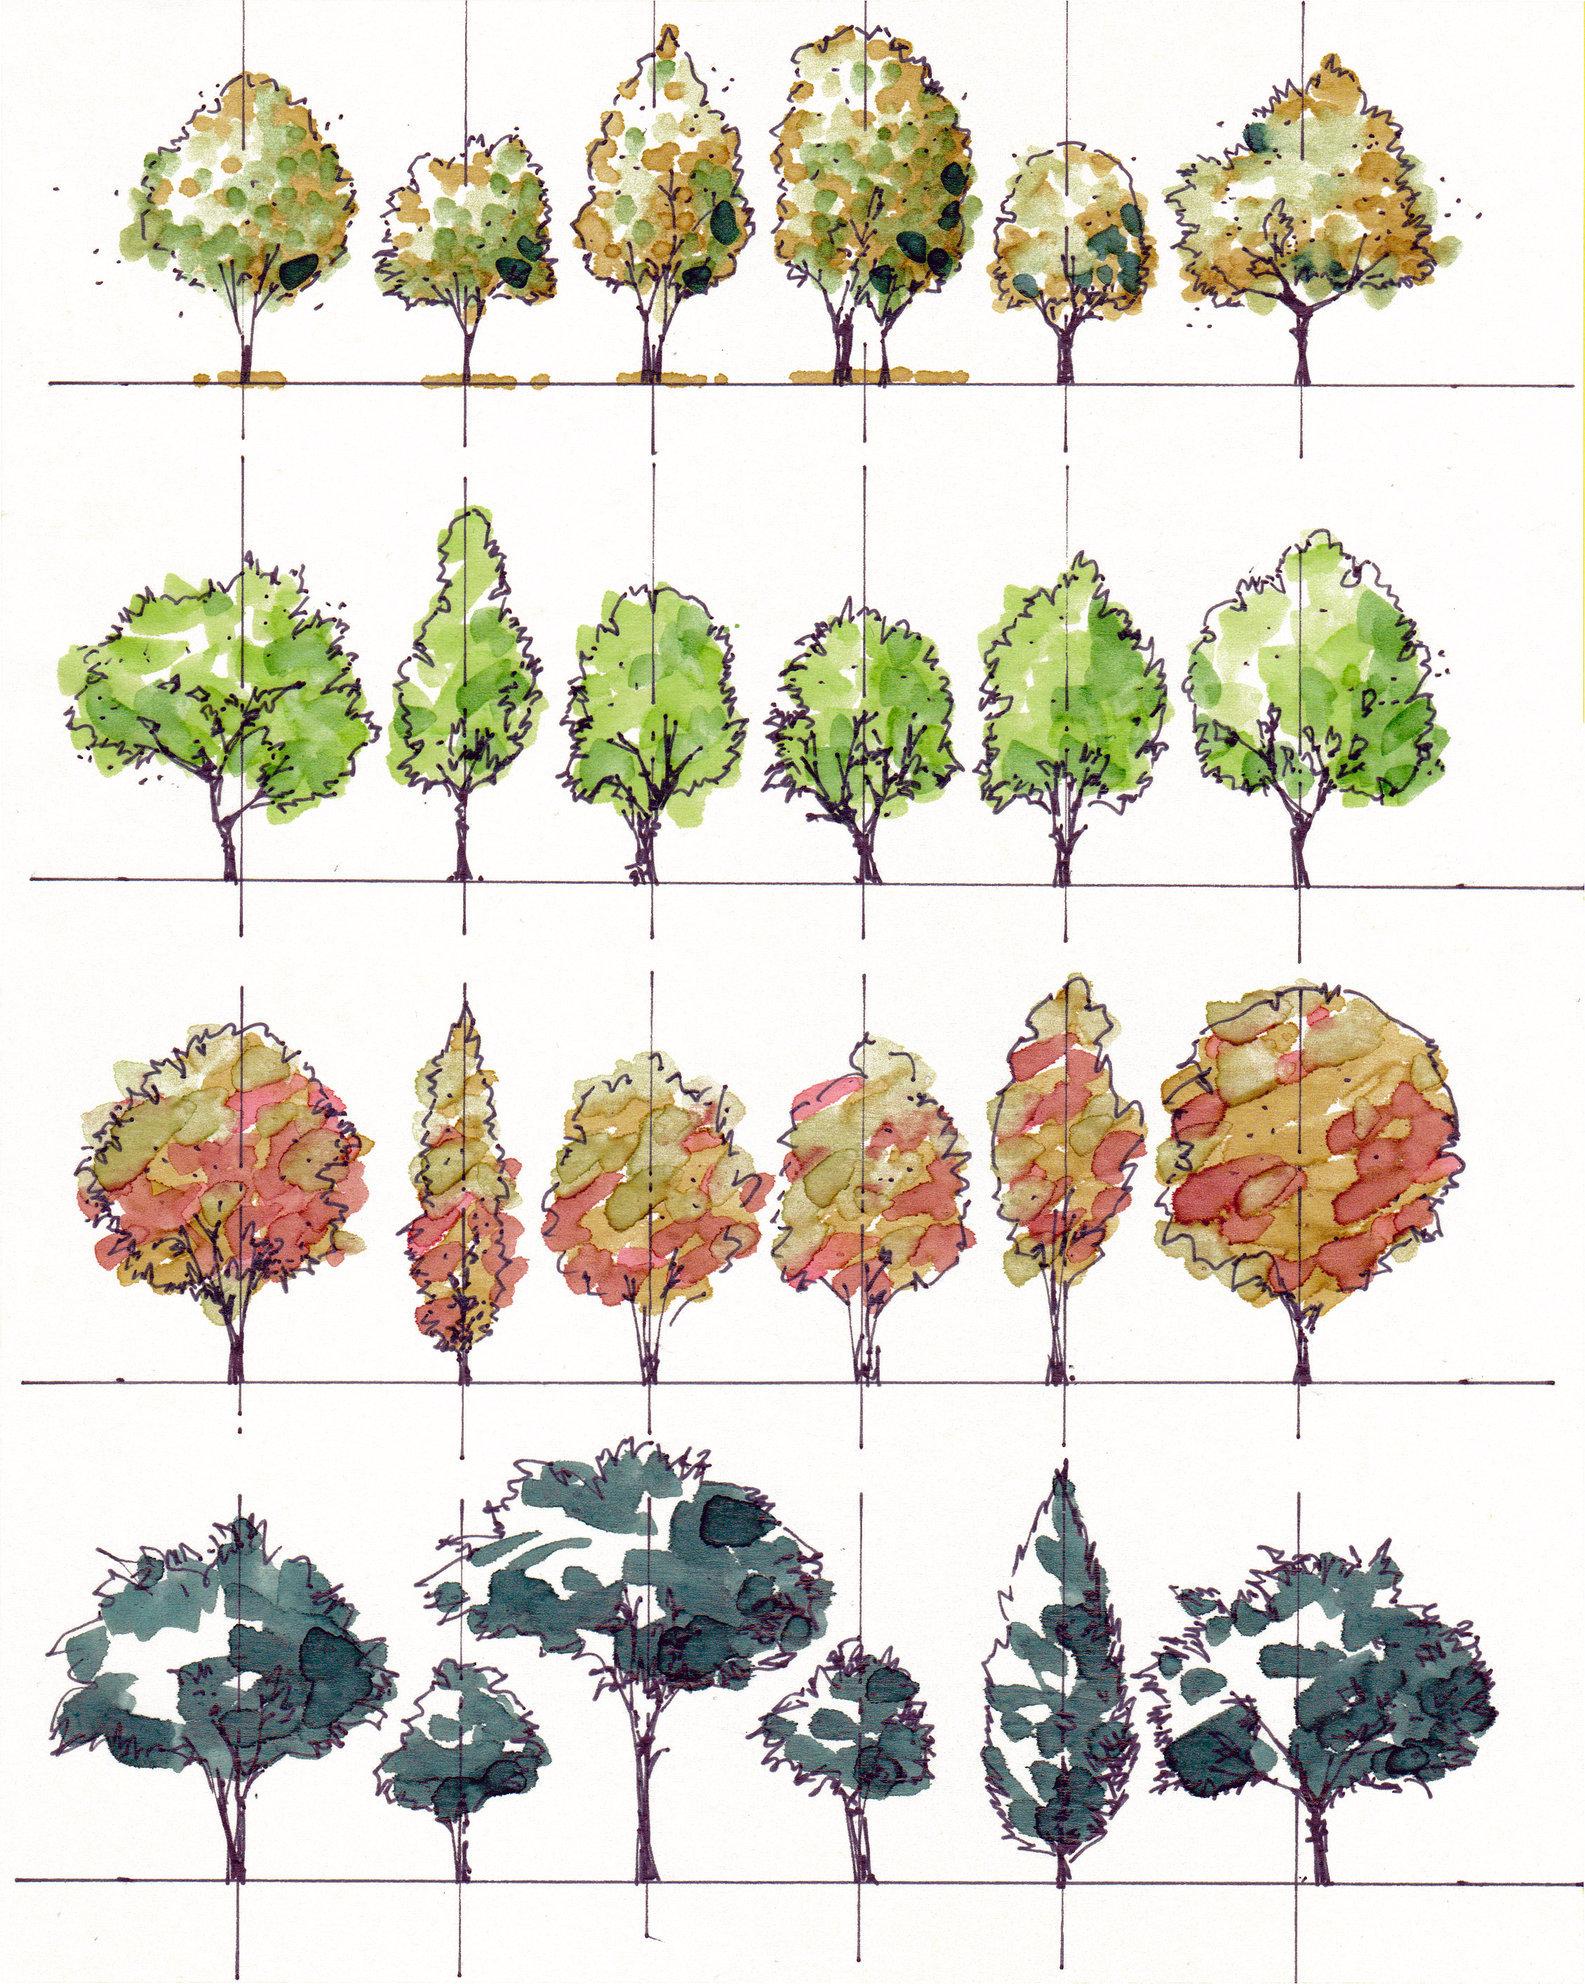 MFLART Graphics: Sketch Library